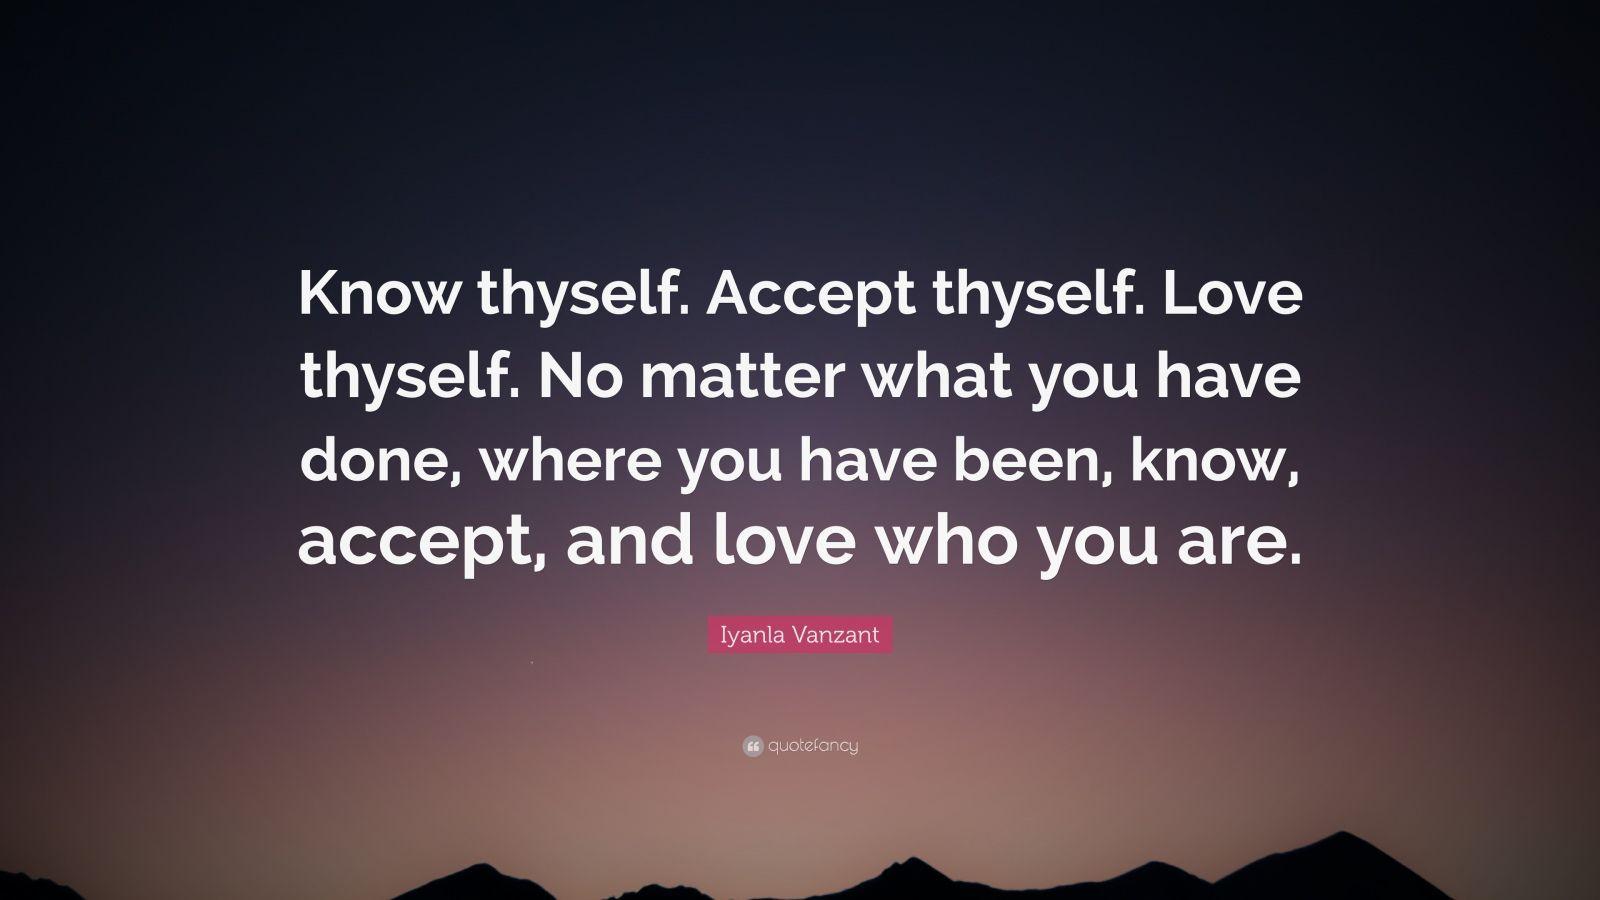 "Iyanla Vanzant Quote: ""Know thyself. Accept thyself. Love thyself. No matter what you have done, where you have been, know, accept, and love who you are."""